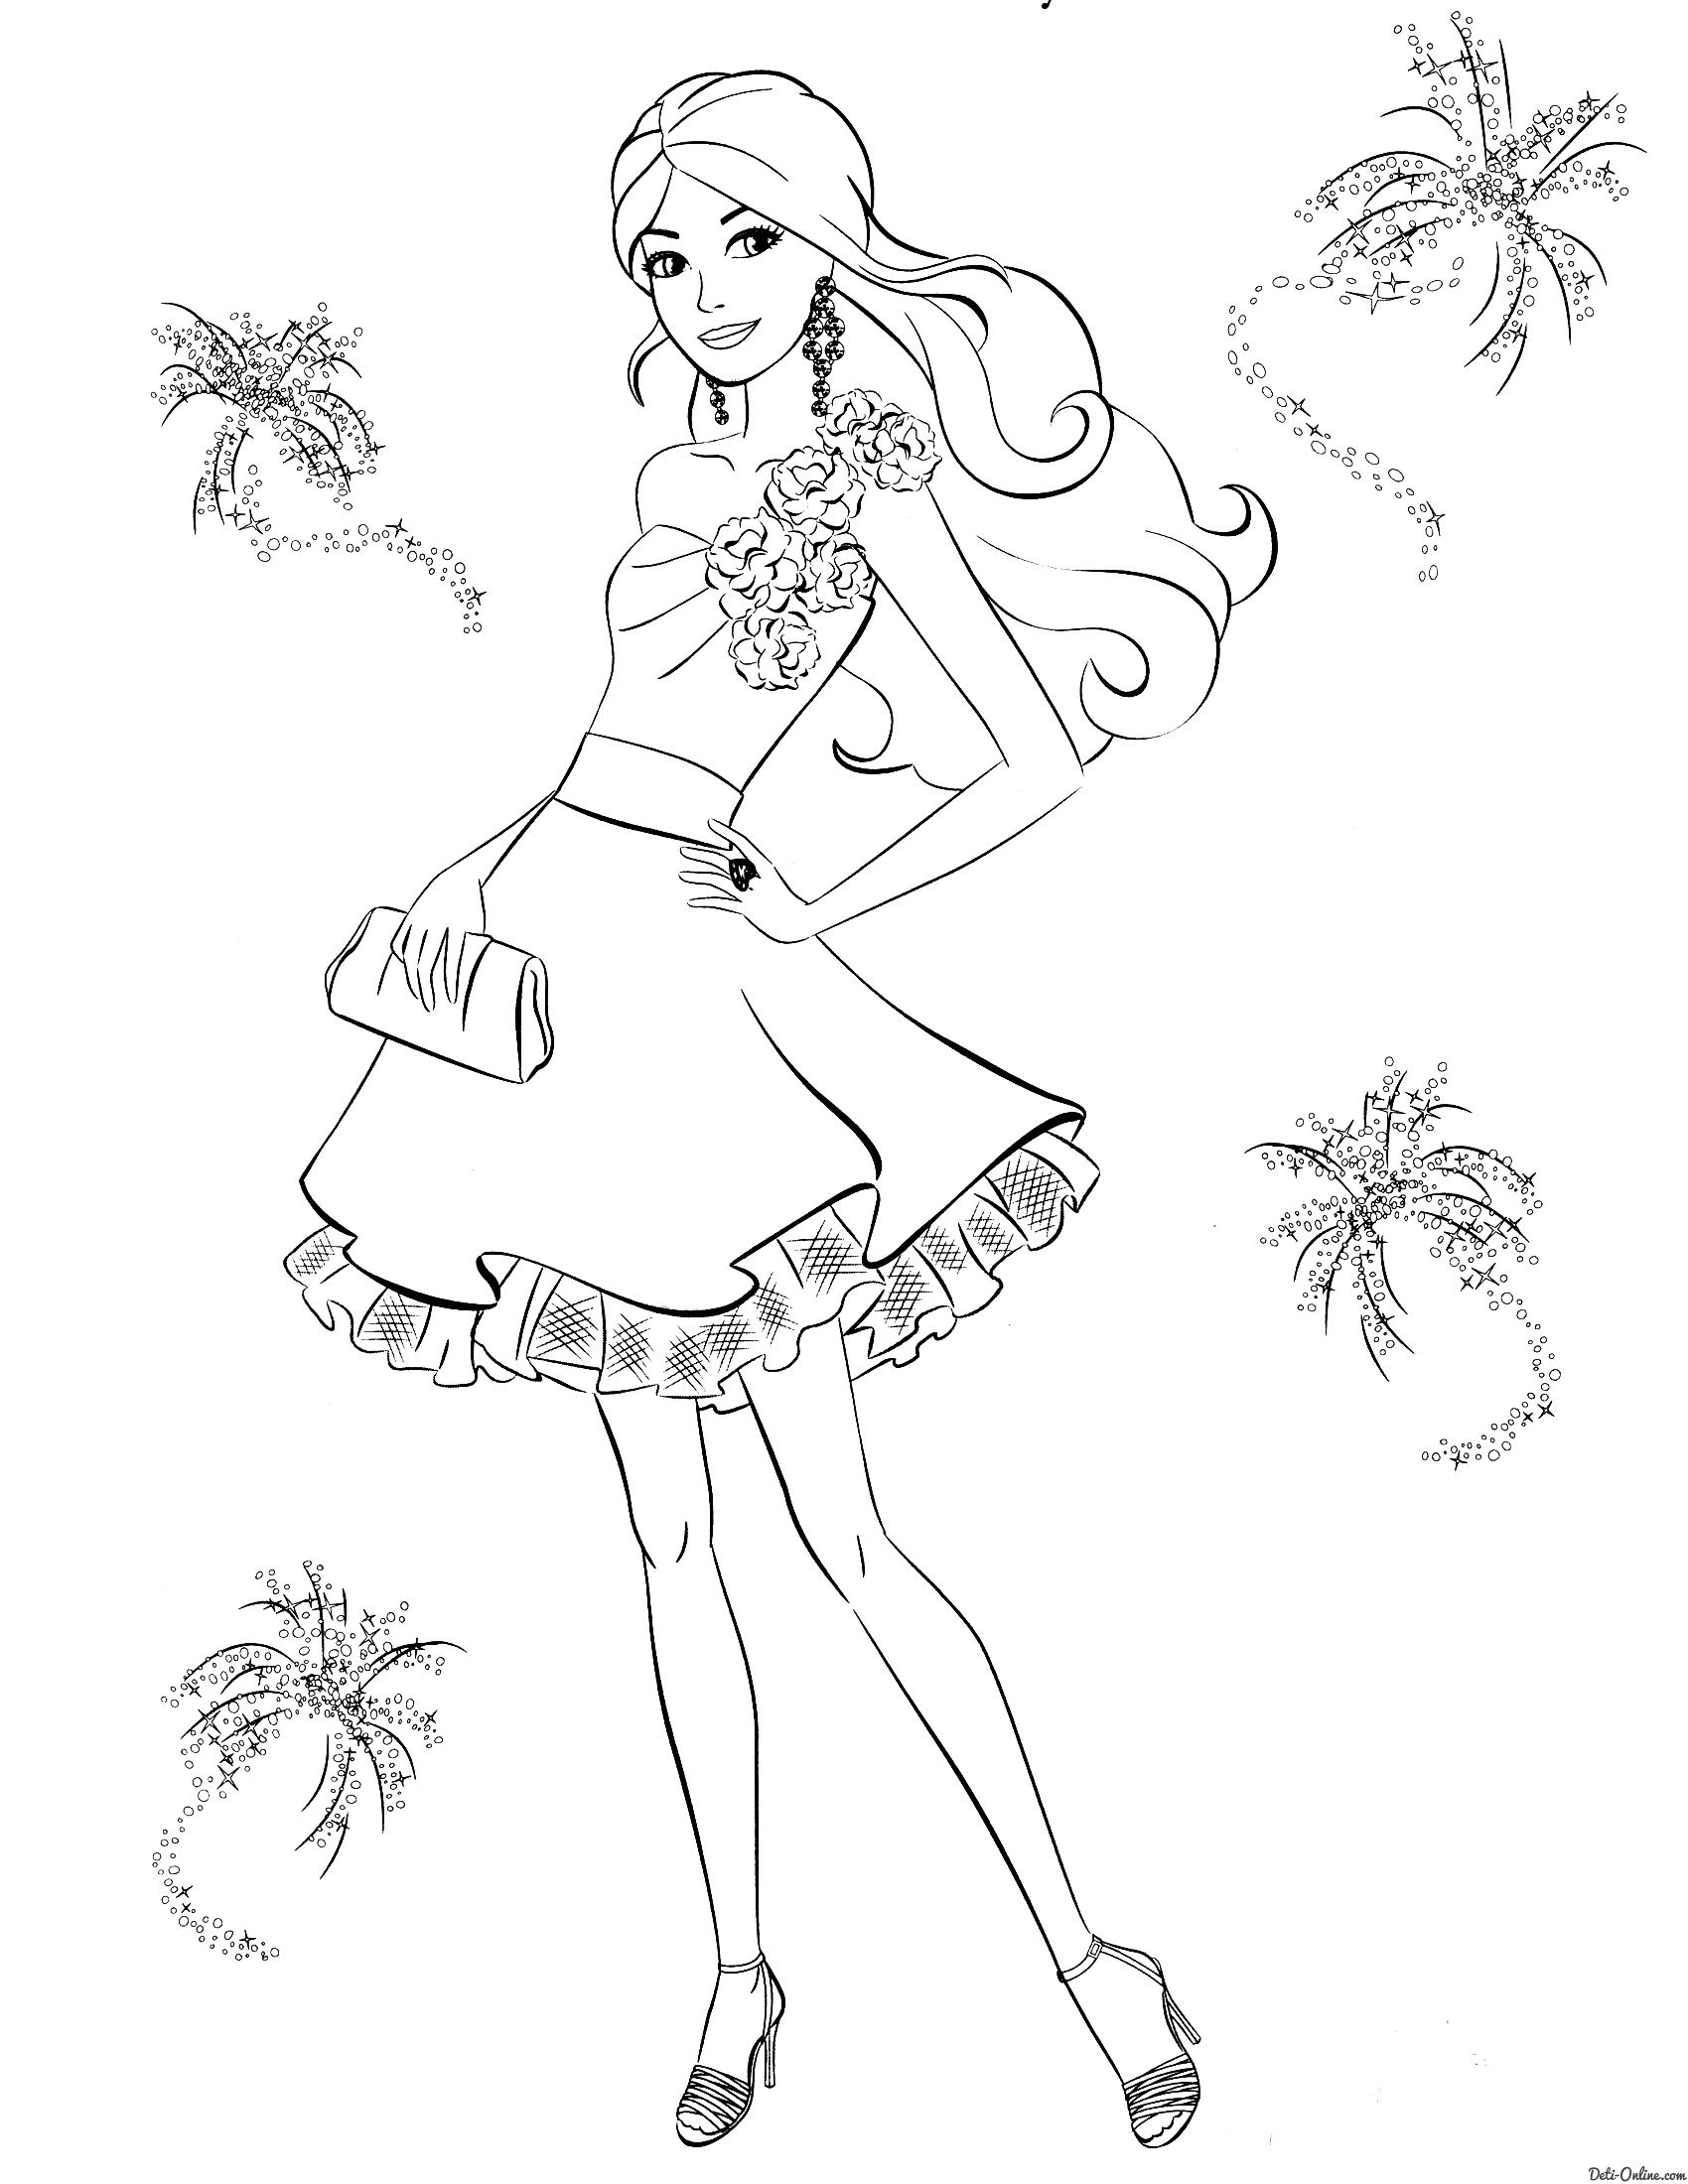 Ausmalbilder Barbie Ballerina :  Ausmalbilder Barbie Pinterest